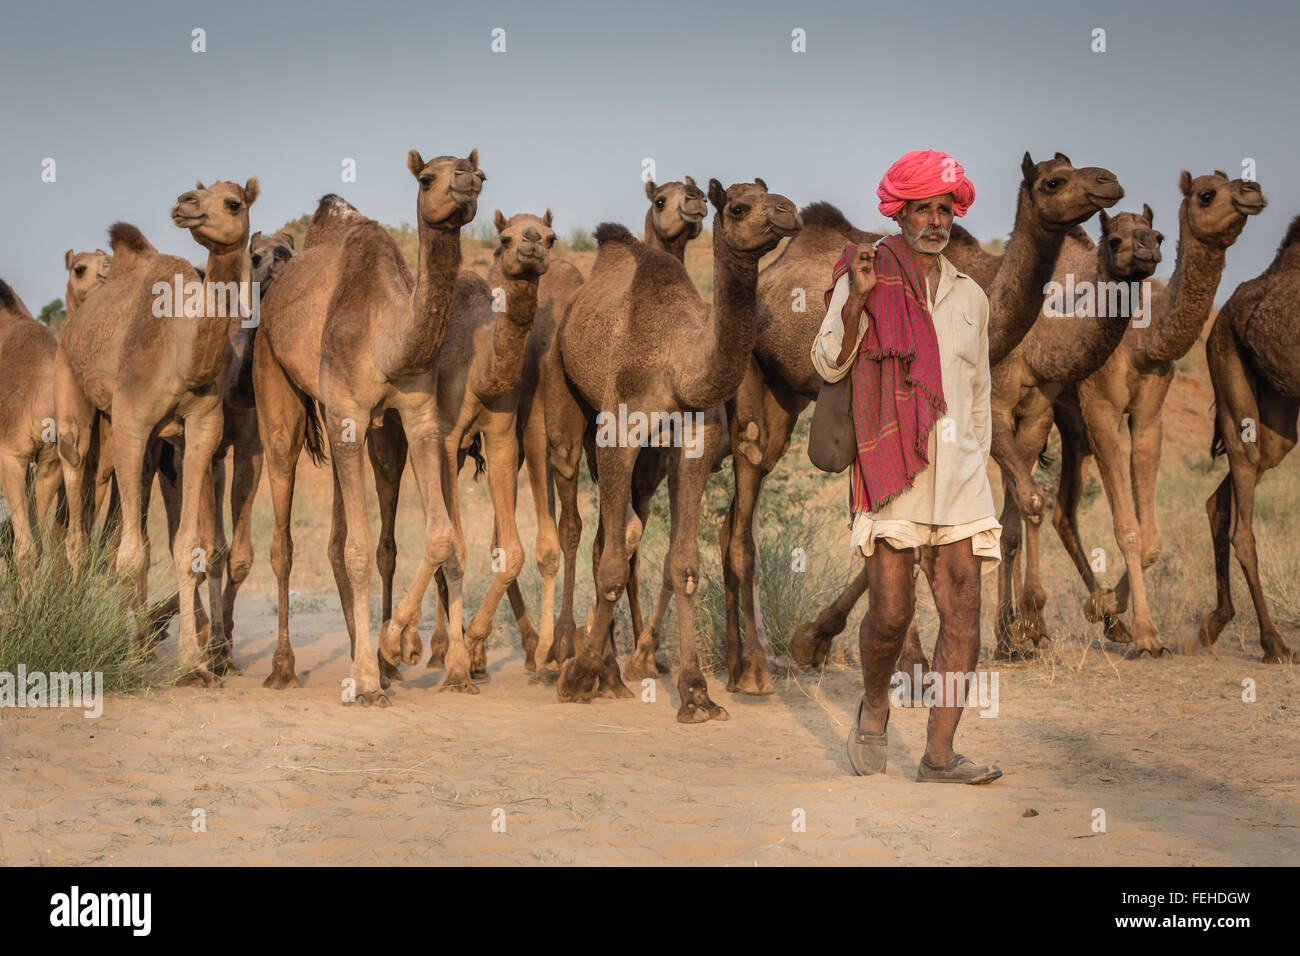 Conductor de camellos con sus camellos en el camino a Pushkar Mela, Feria de camellos de Pushkar, Rajastán, Imagen De Stock